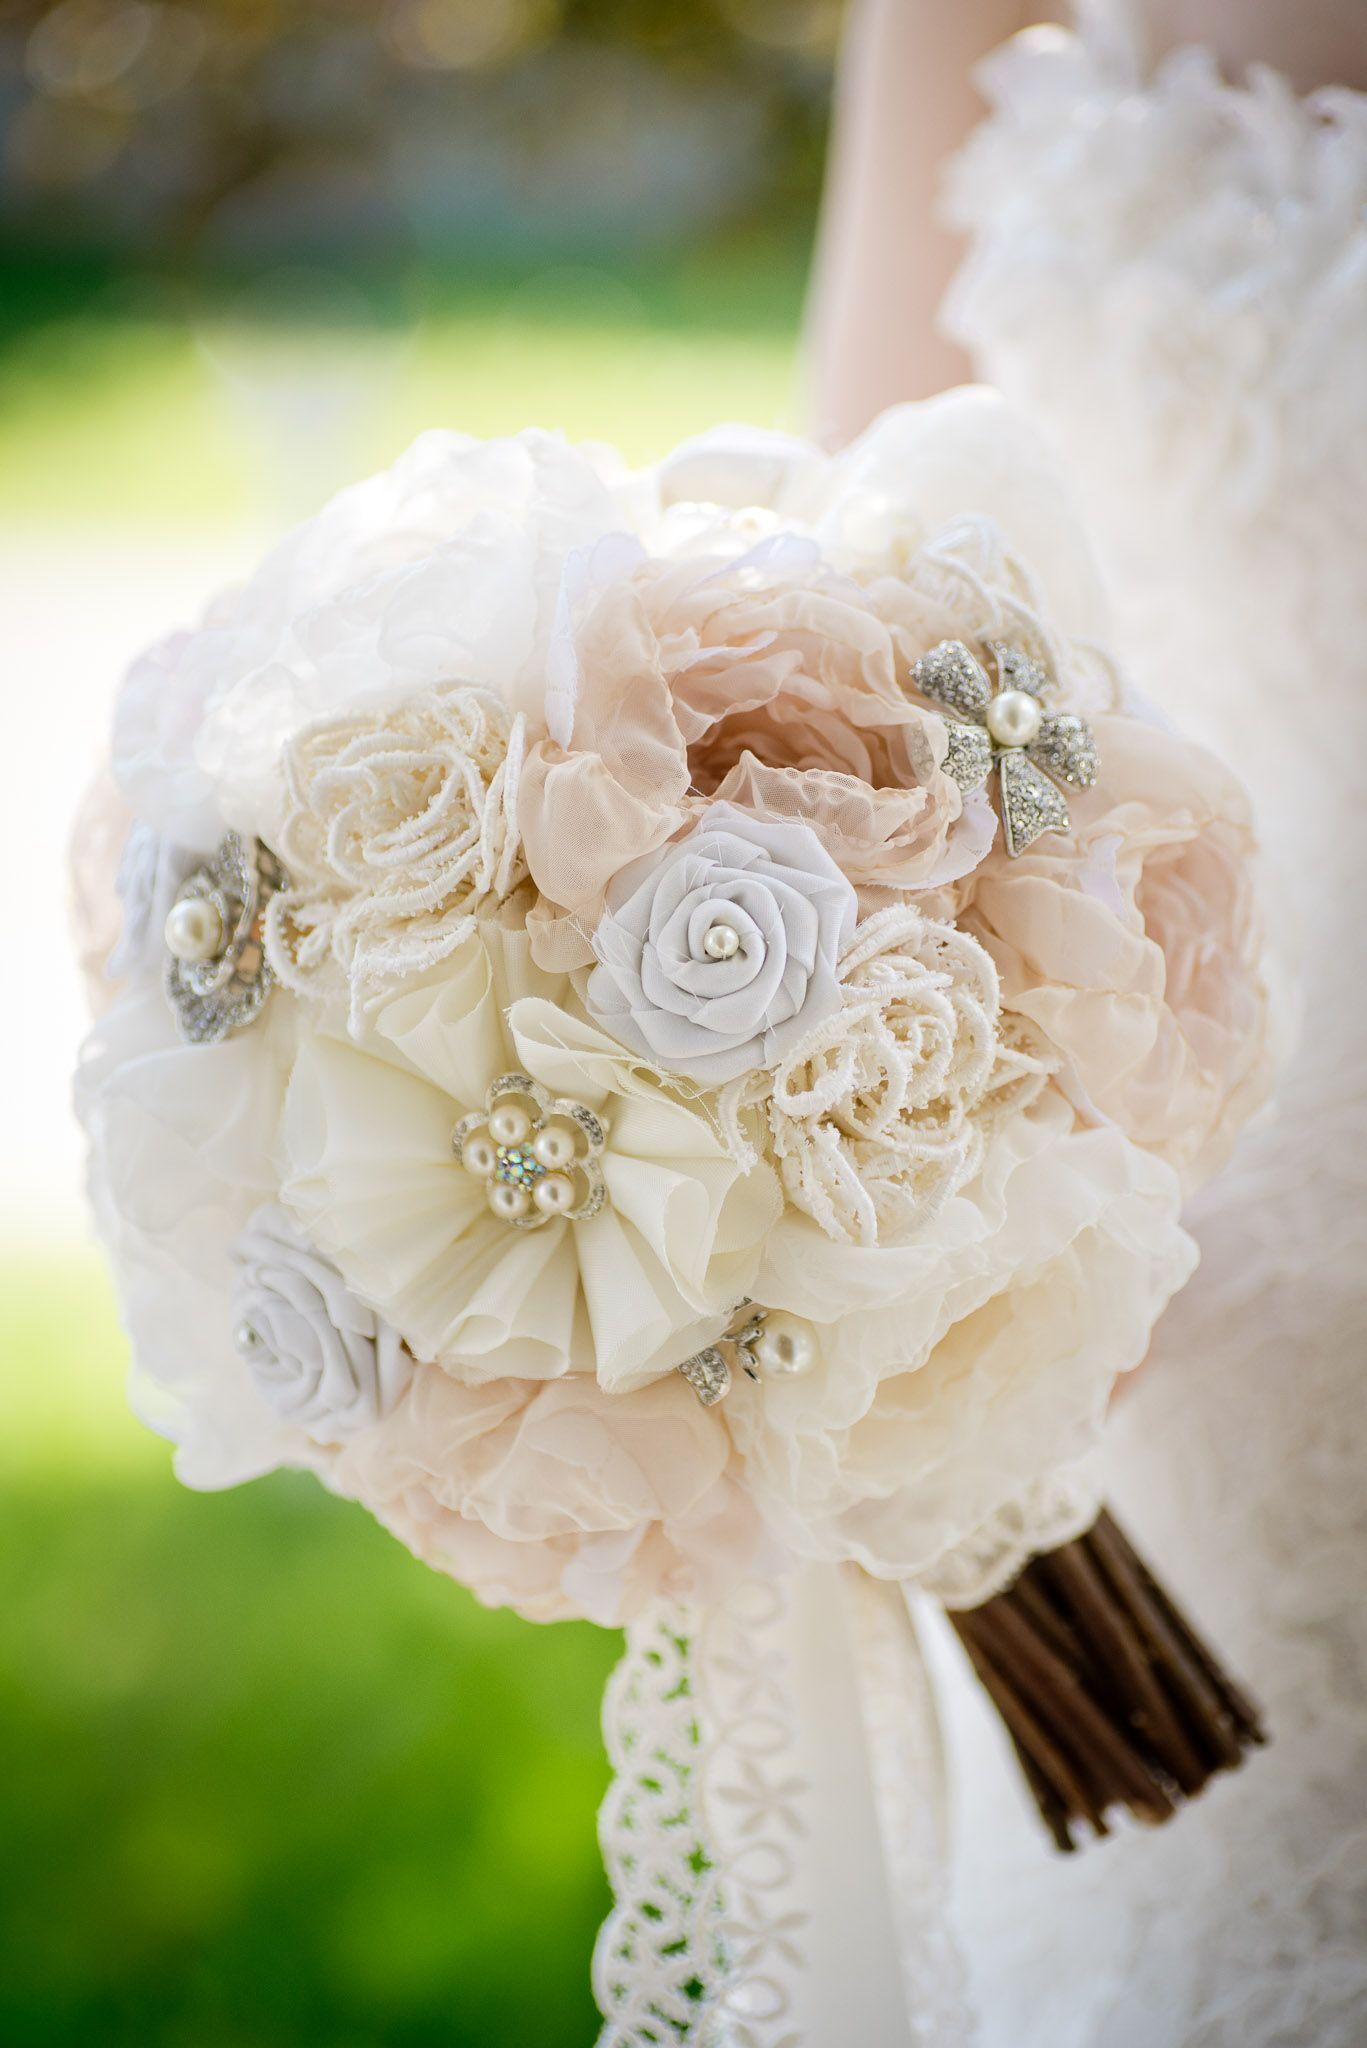 Blog Mlle Artsy Fabric Flower Brooch Bouquet Handmade Diy Workshop